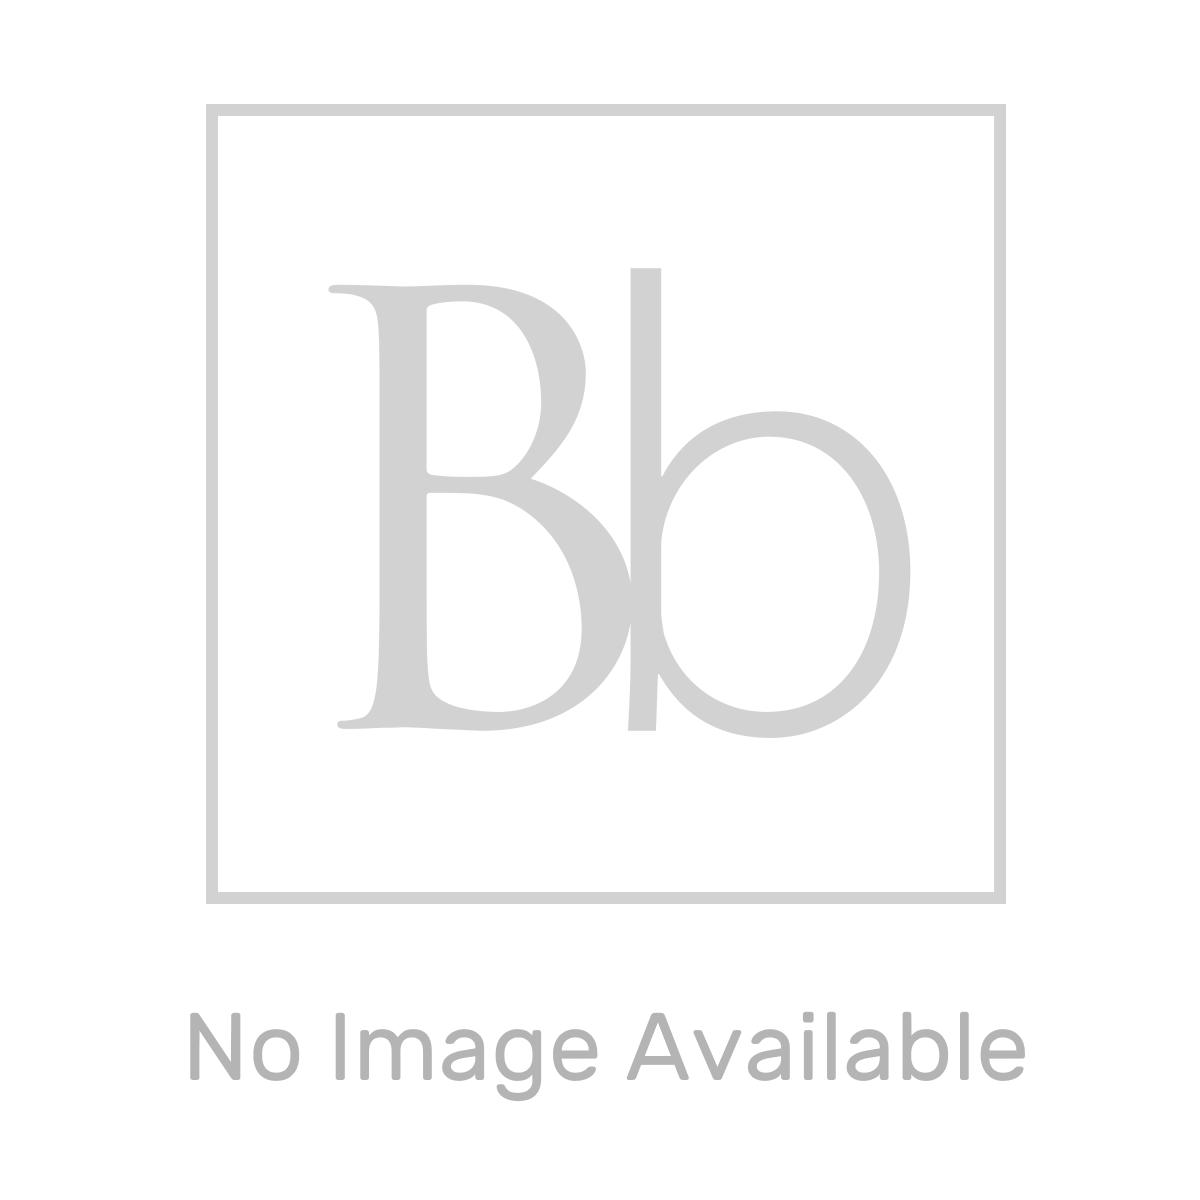 RAK Series 600 Short Projection Toilet 600mm Bowl